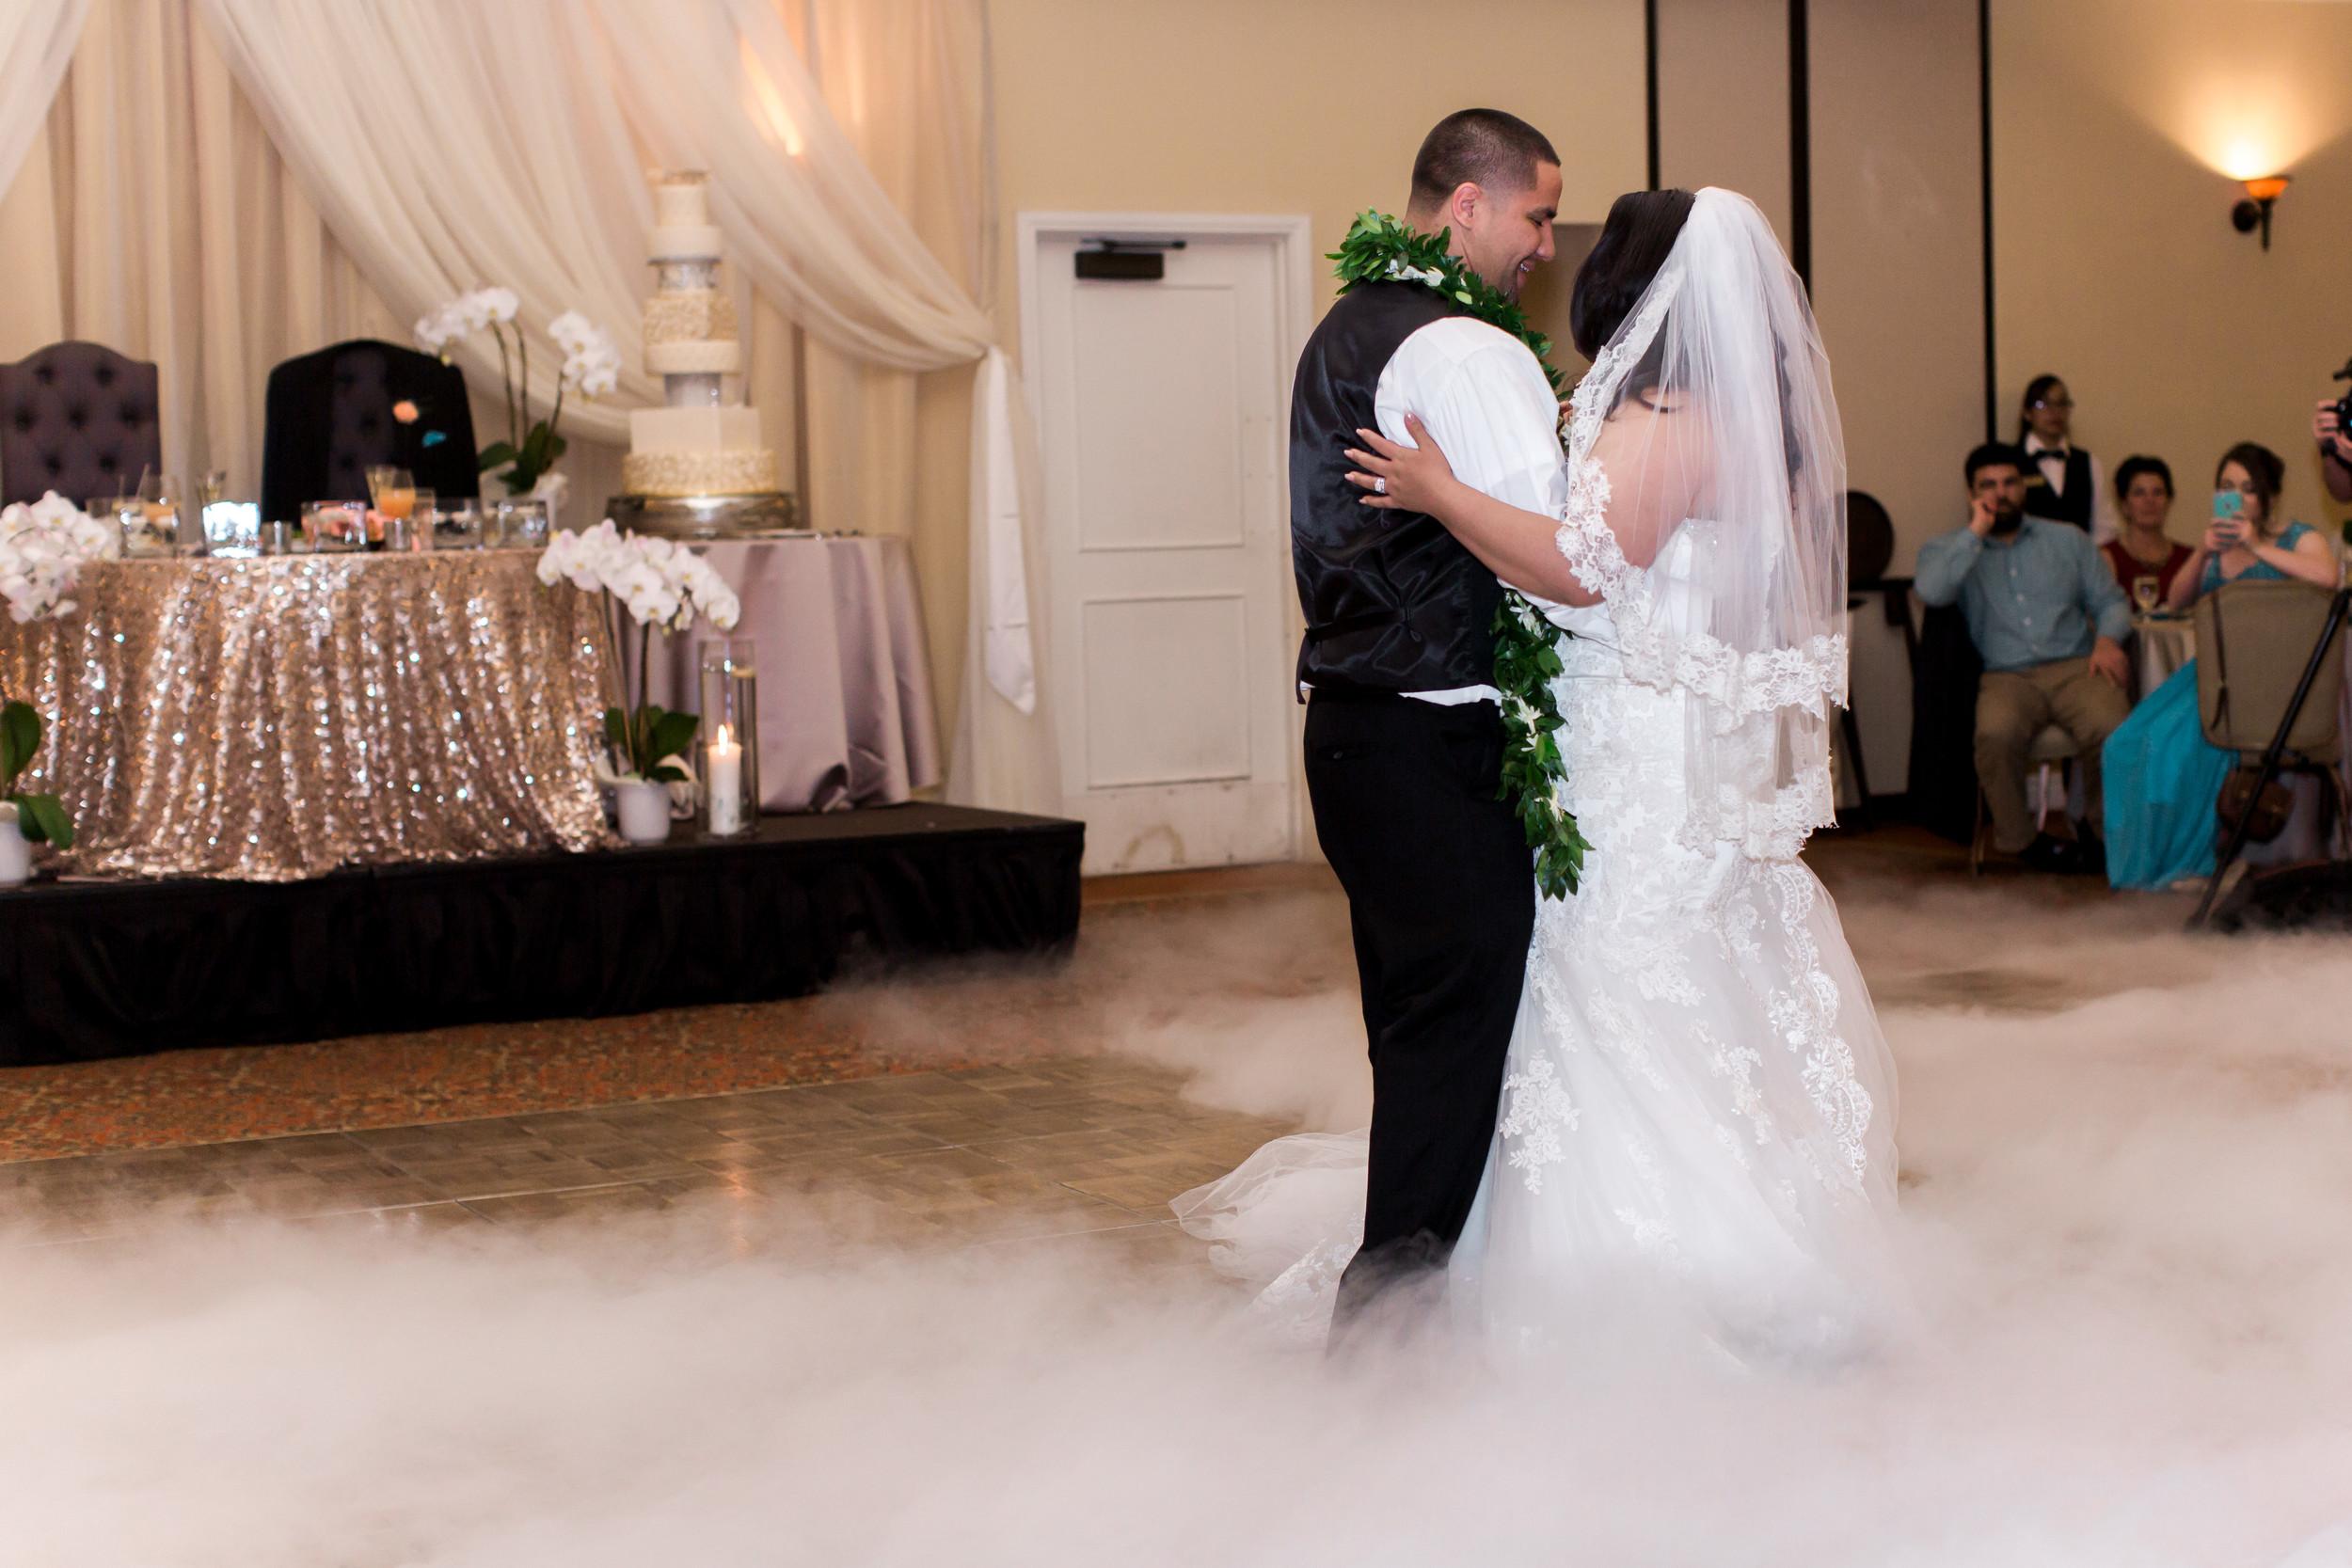 hawaiian-inspired-wedding-at-blackhawk-country-club-3544.jpg